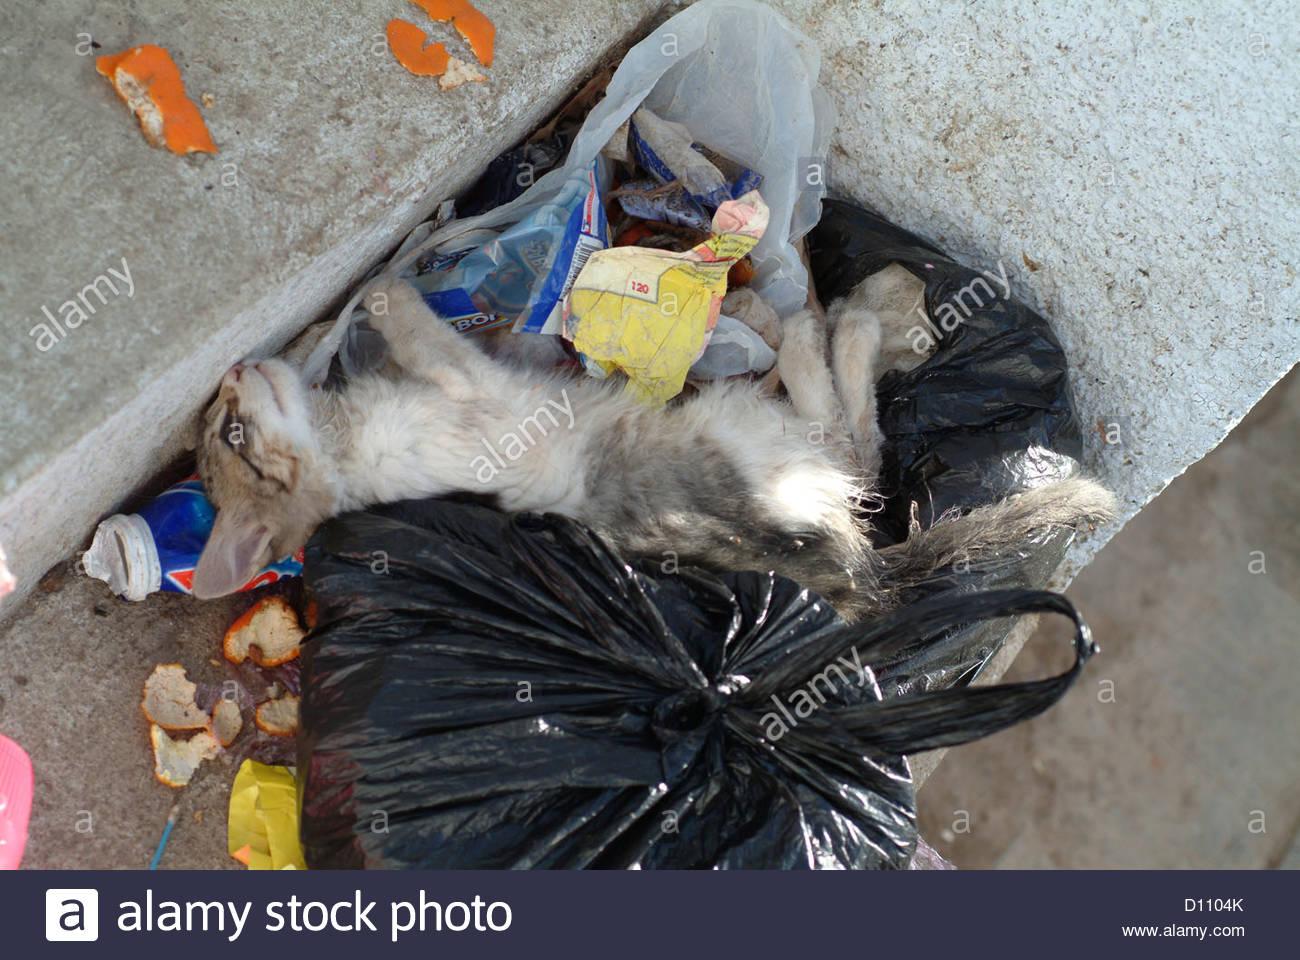 death pet pets animal animals mistreatment mistre - Stock Image